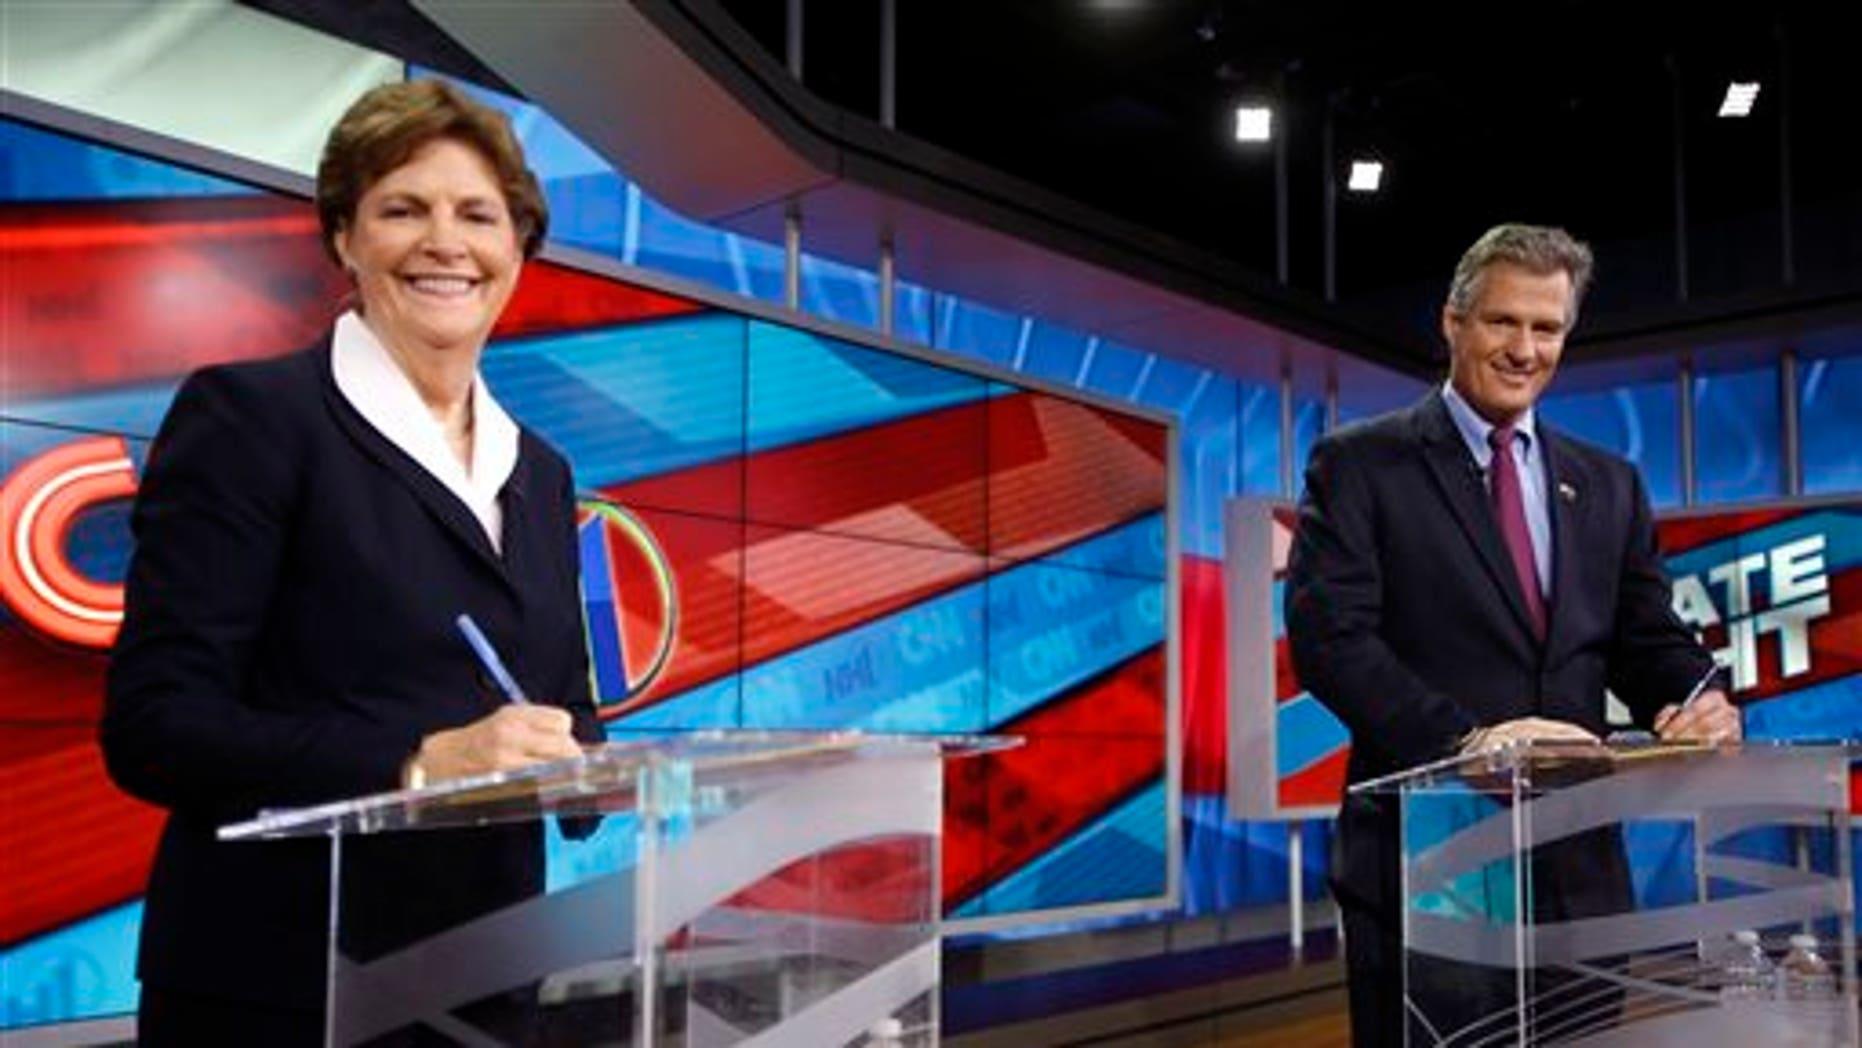 Oct. 23, 2014: U.S. Sen. Jeanne Shaheen, D-N.H., left, and former Massachusetts Republican U.S. Sen. Scott Brown before a live televised U.S. Senate debate.